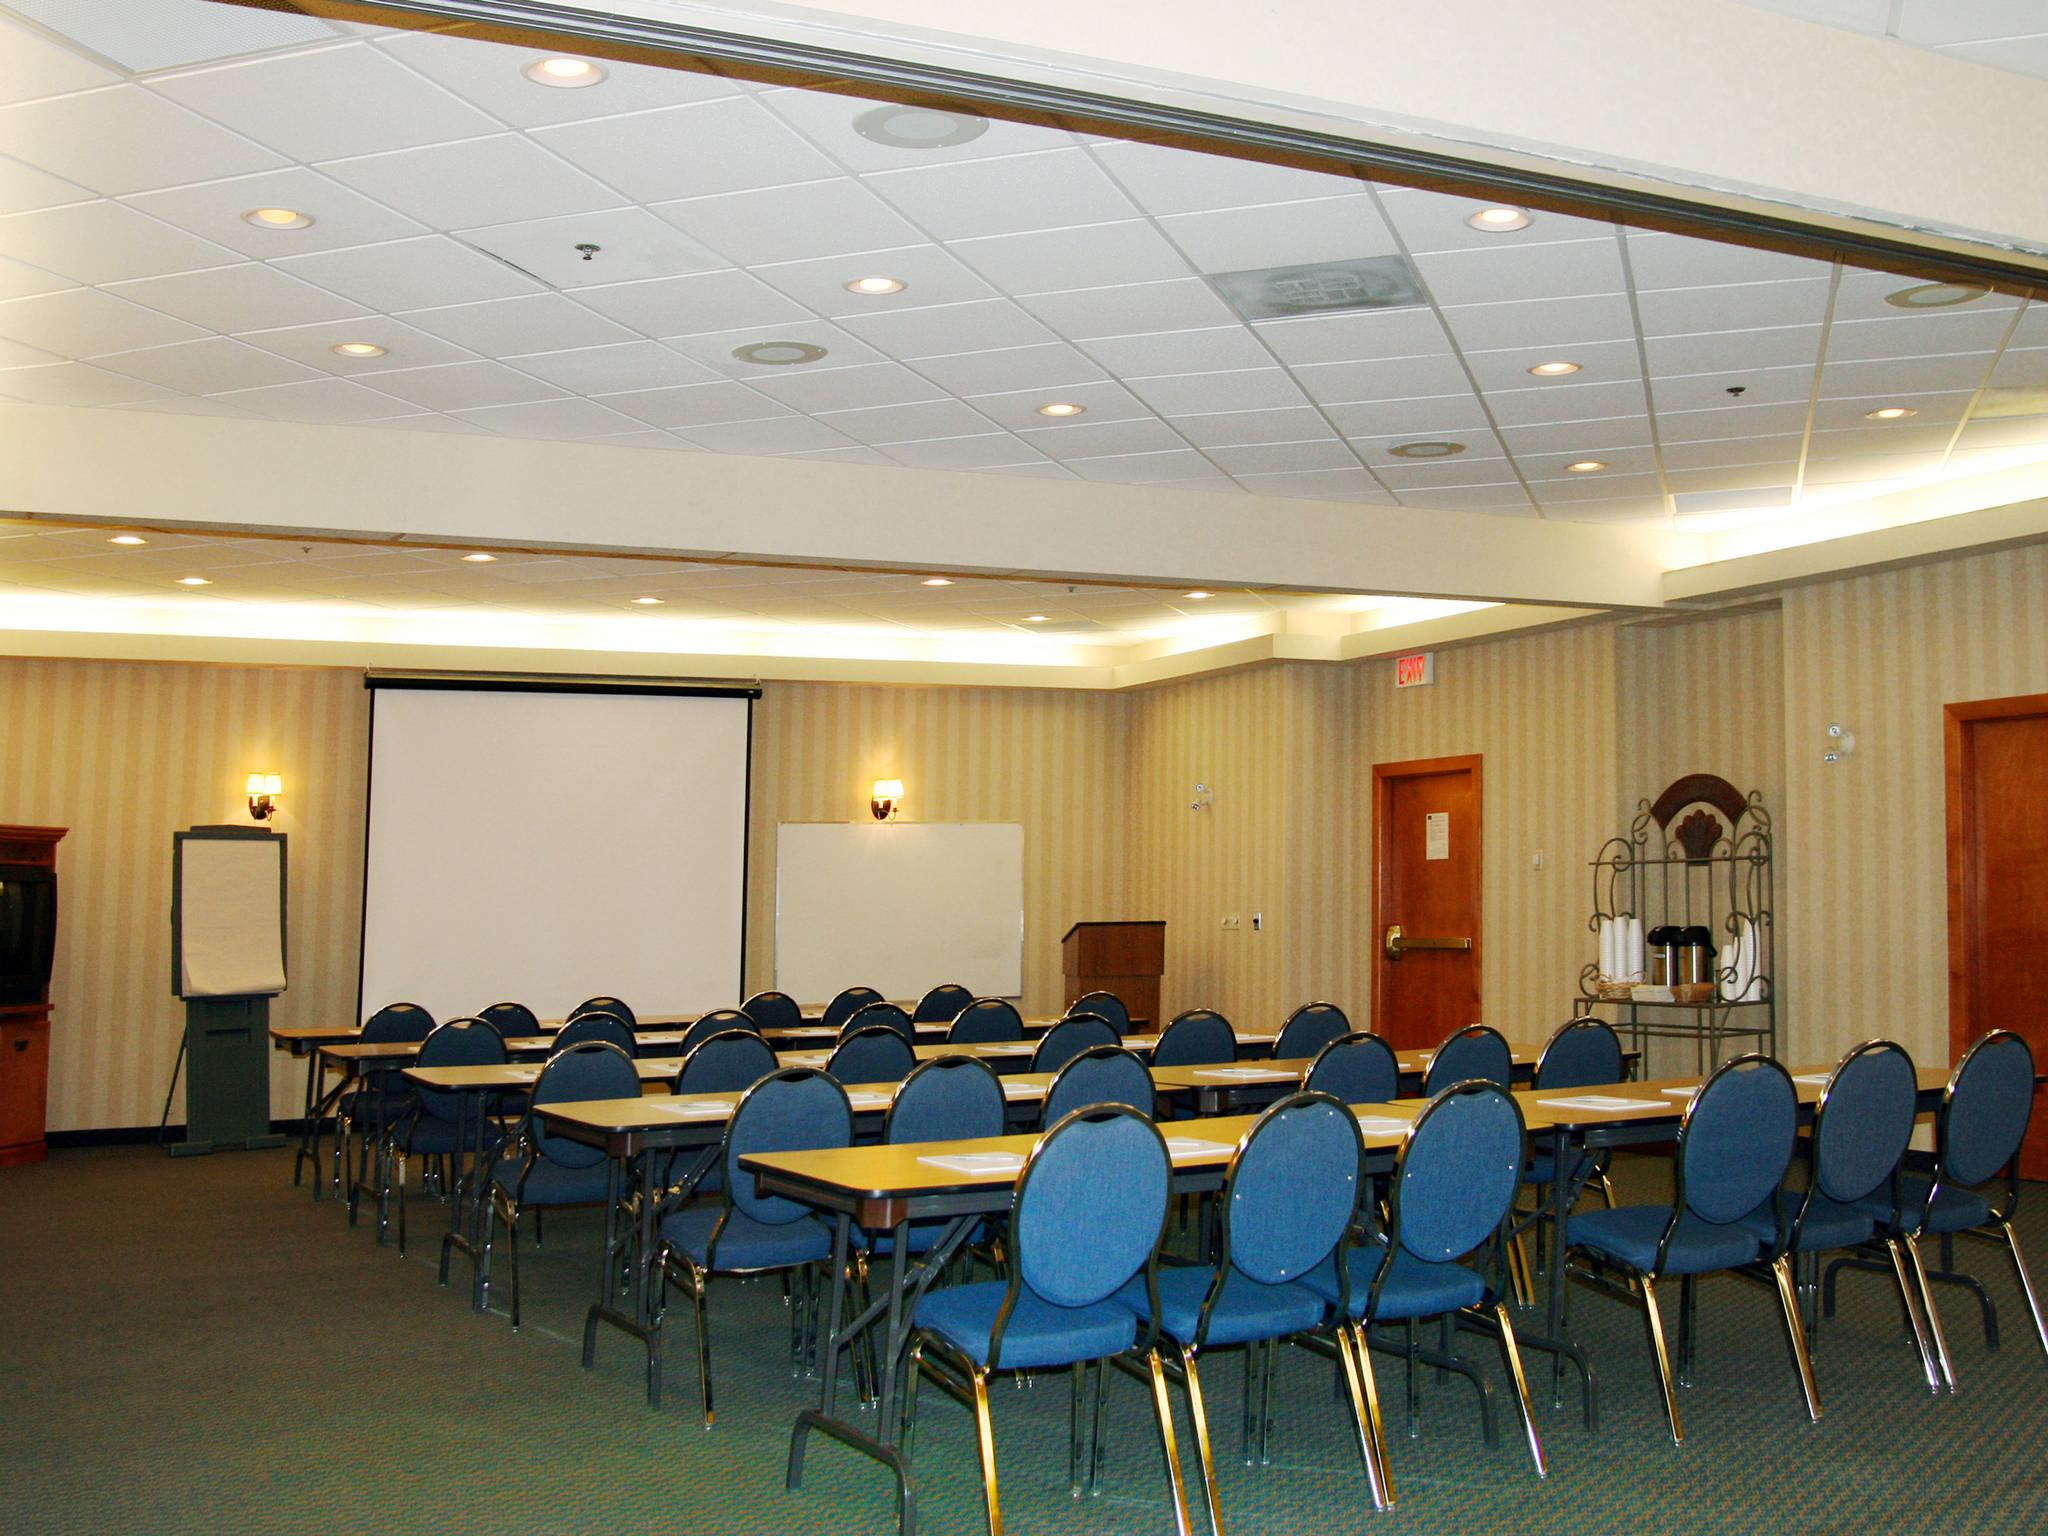 Hôtel Hampton Inn & Suites By Hilton Calgary-University Northwest, Alb., Canada - Salle de conférence